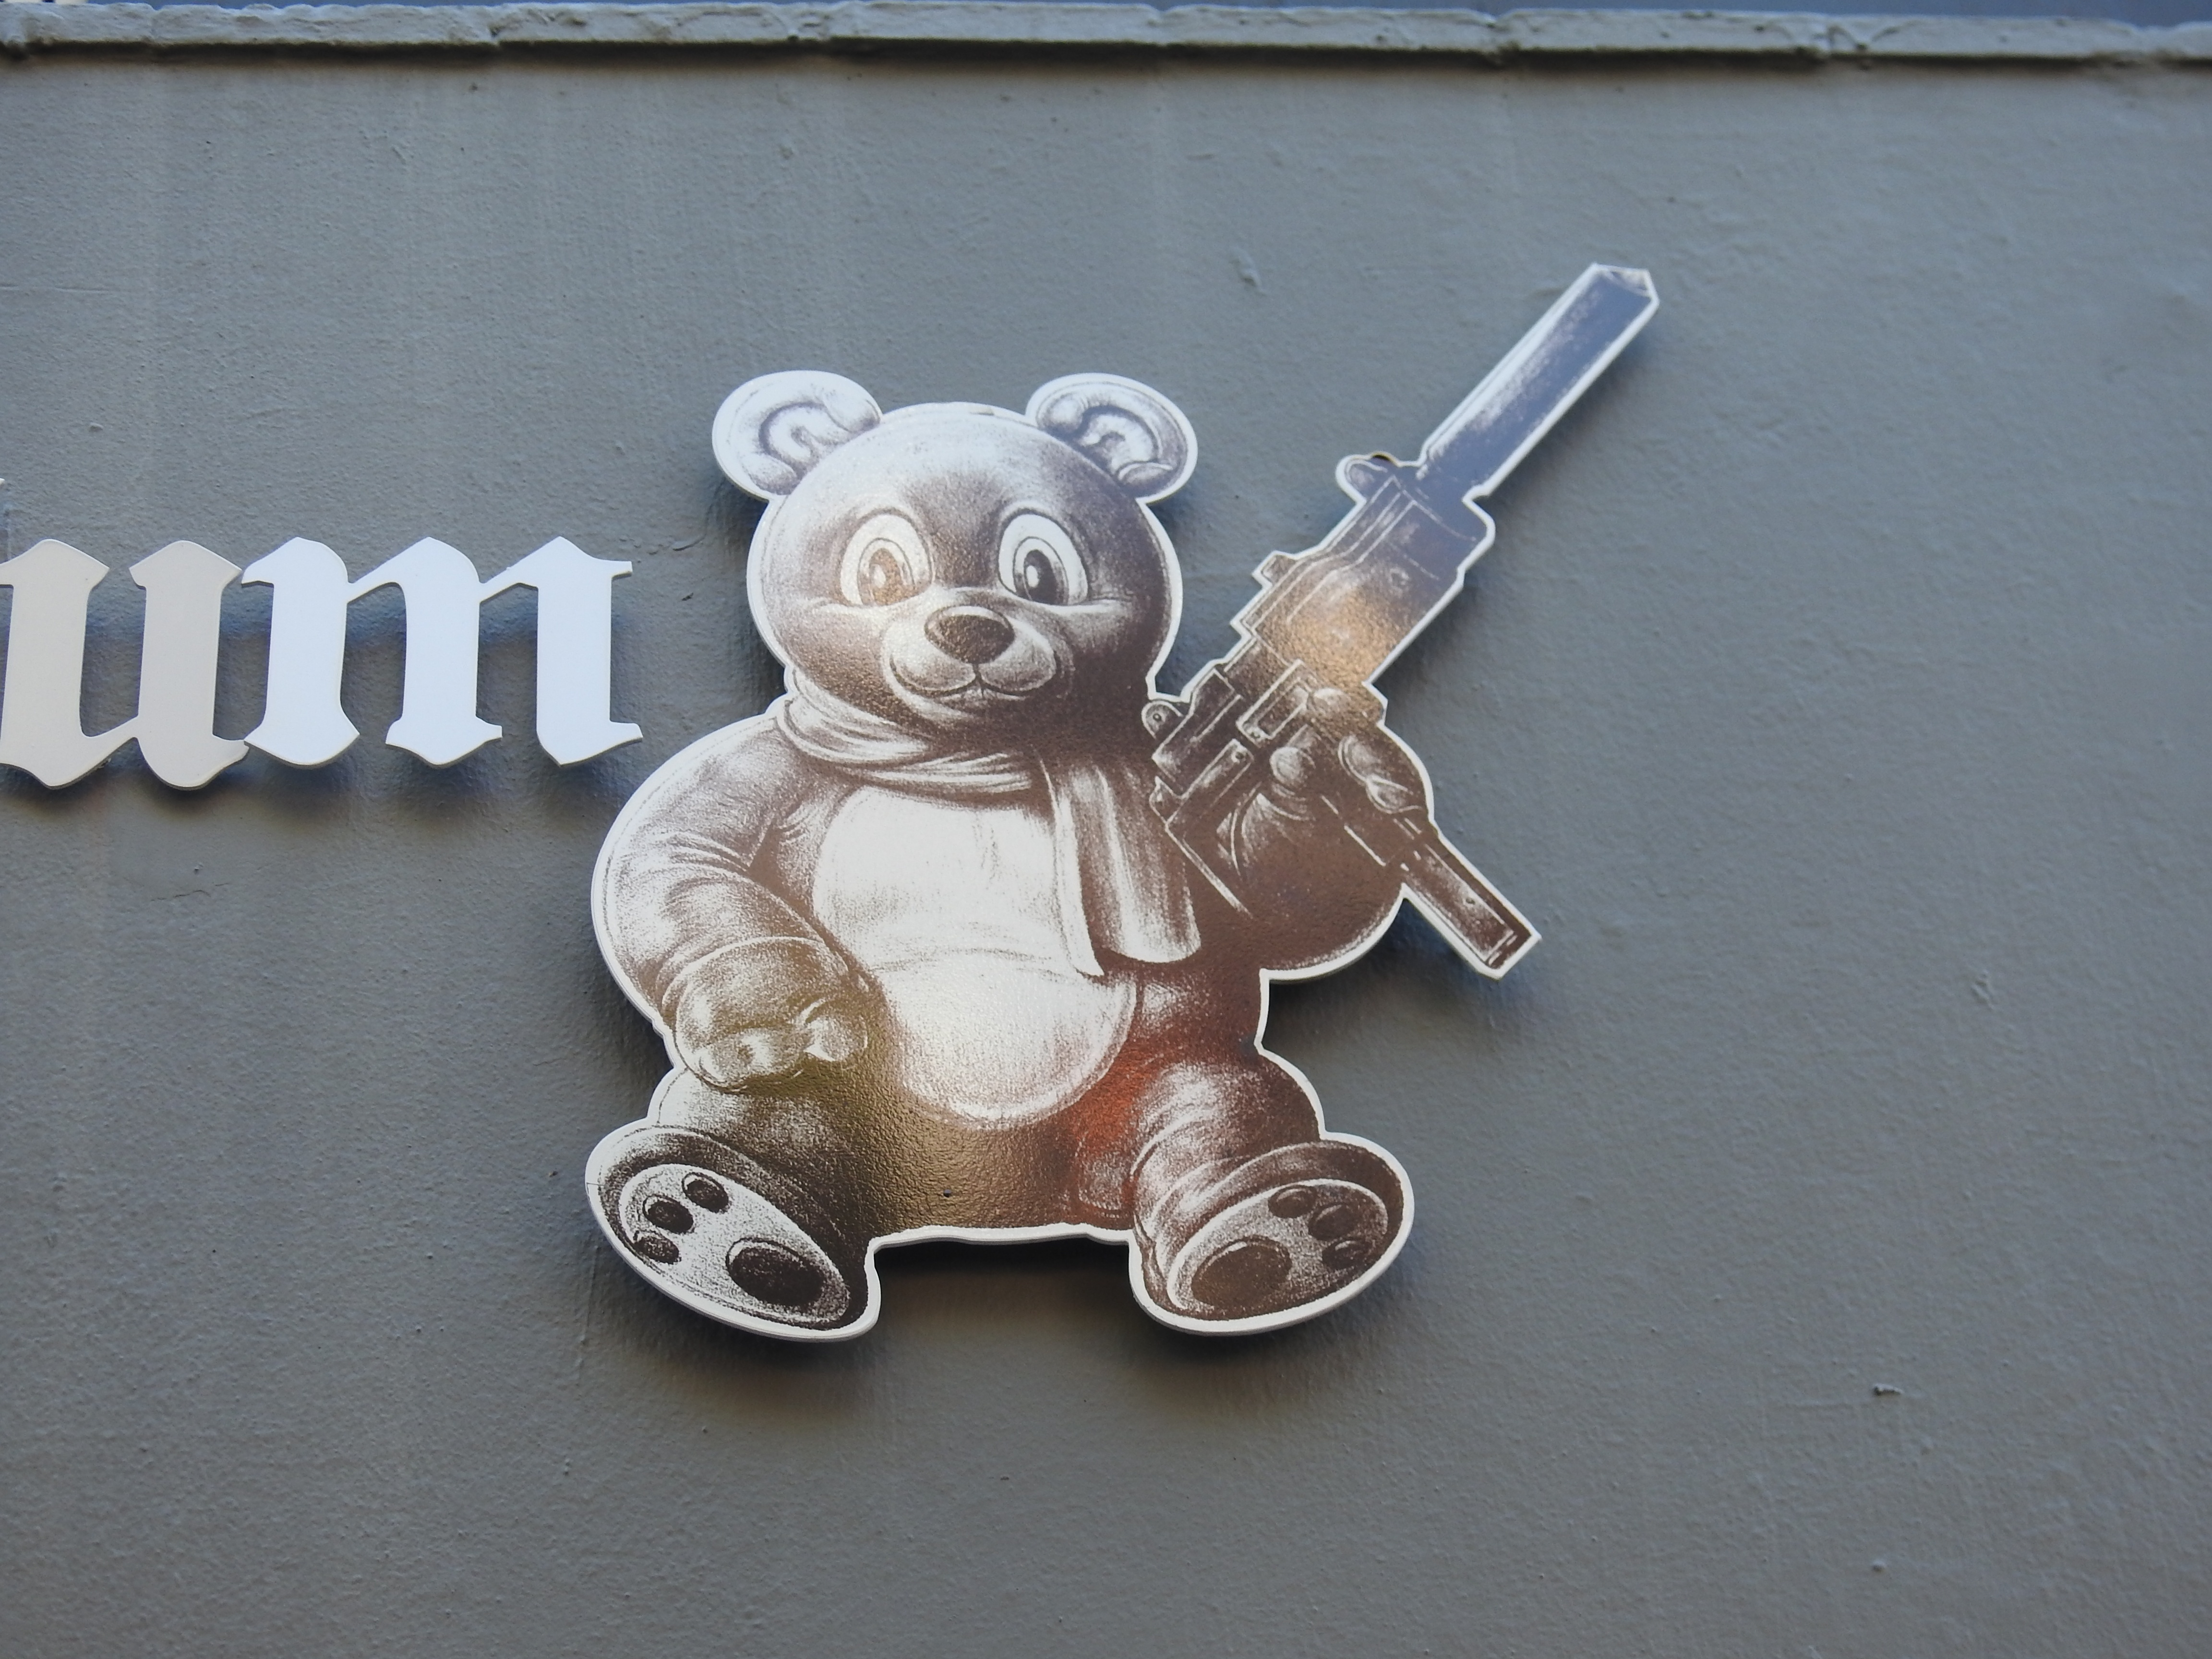 Arm_bears-1.jpg